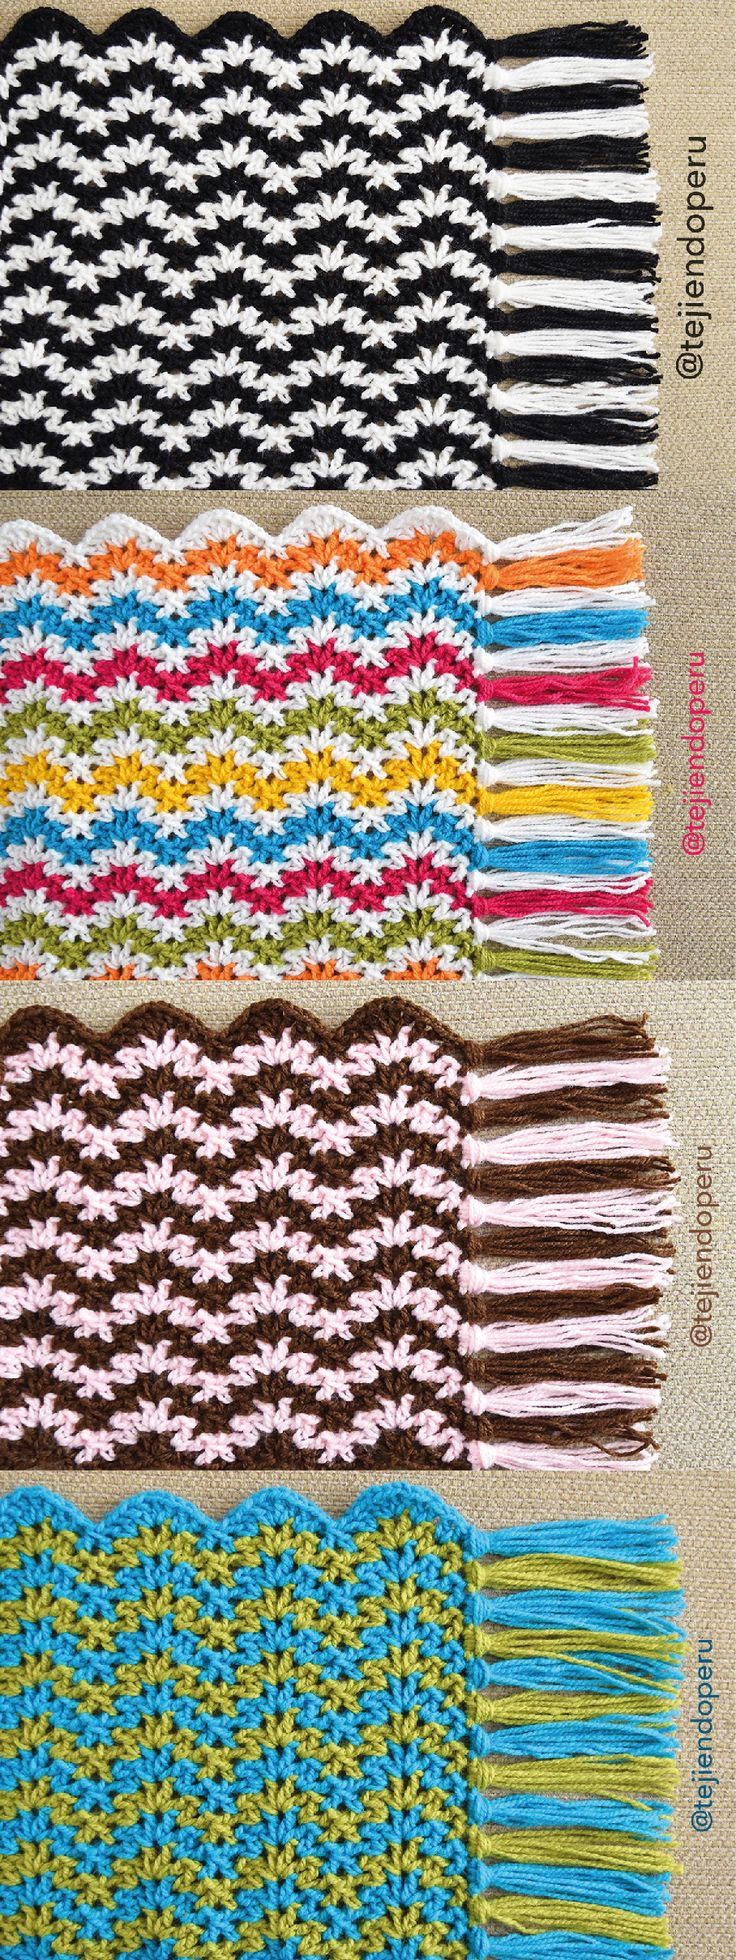 88 best puntos fantasía crochet images on Pinterest | Crochet ...